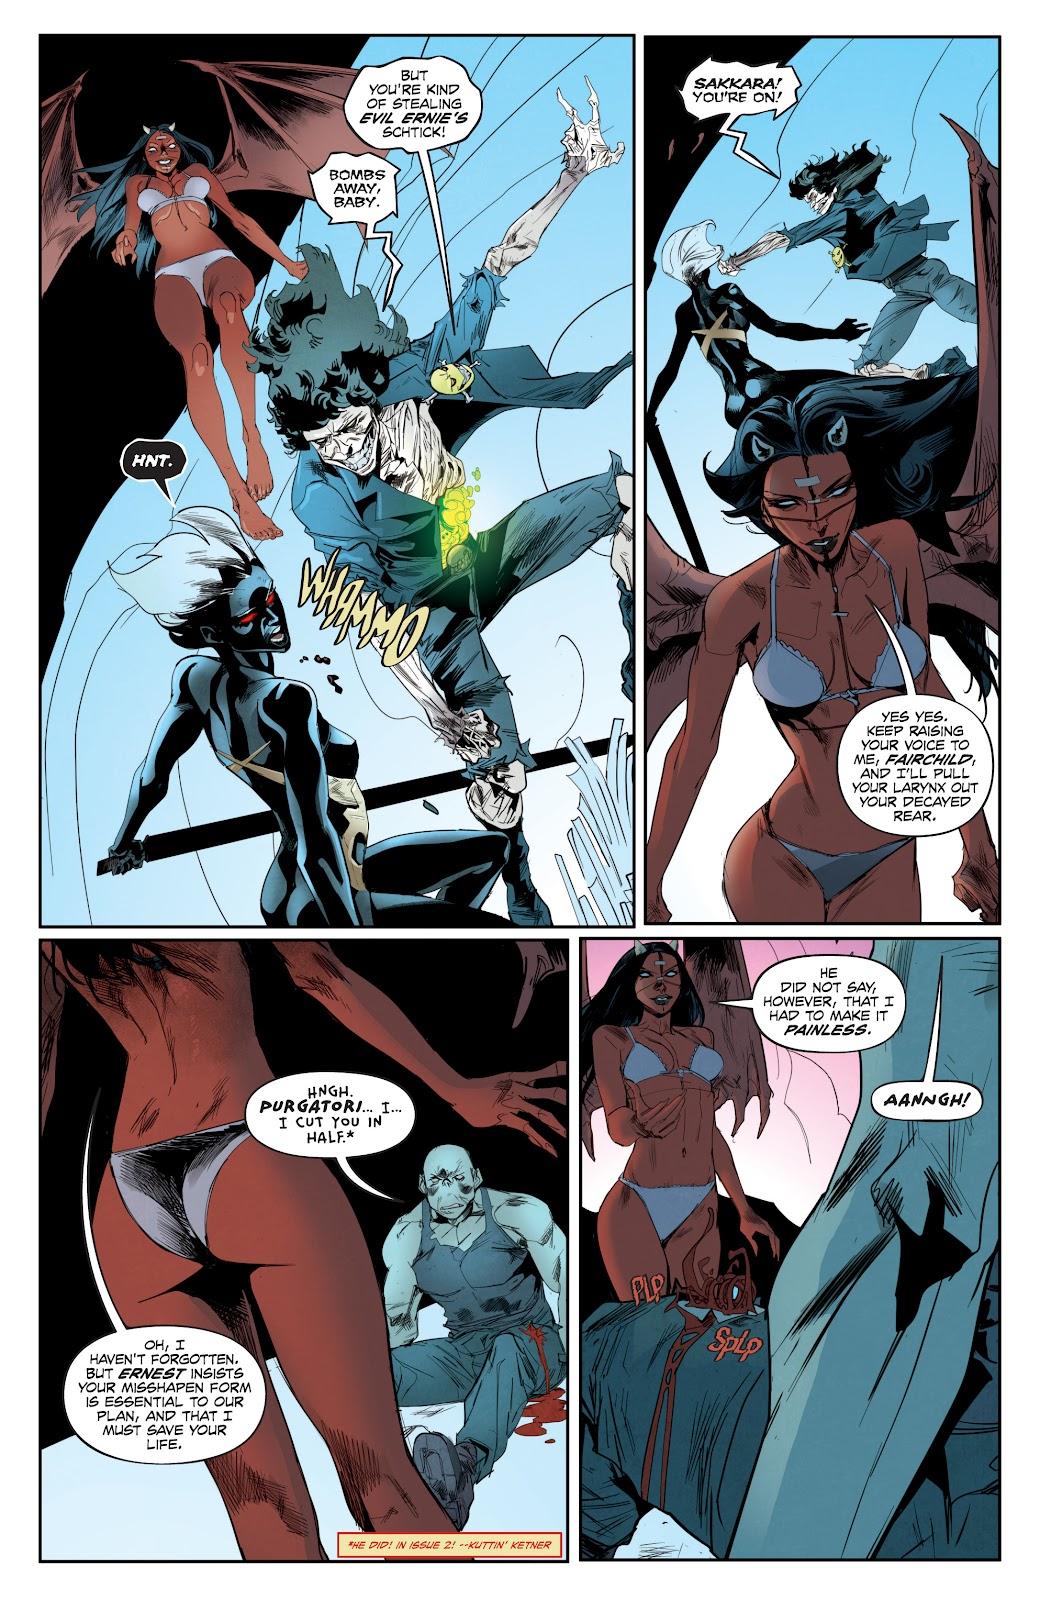 Read online Hack/Slash vs. Chaos comic -  Issue #4 - 16